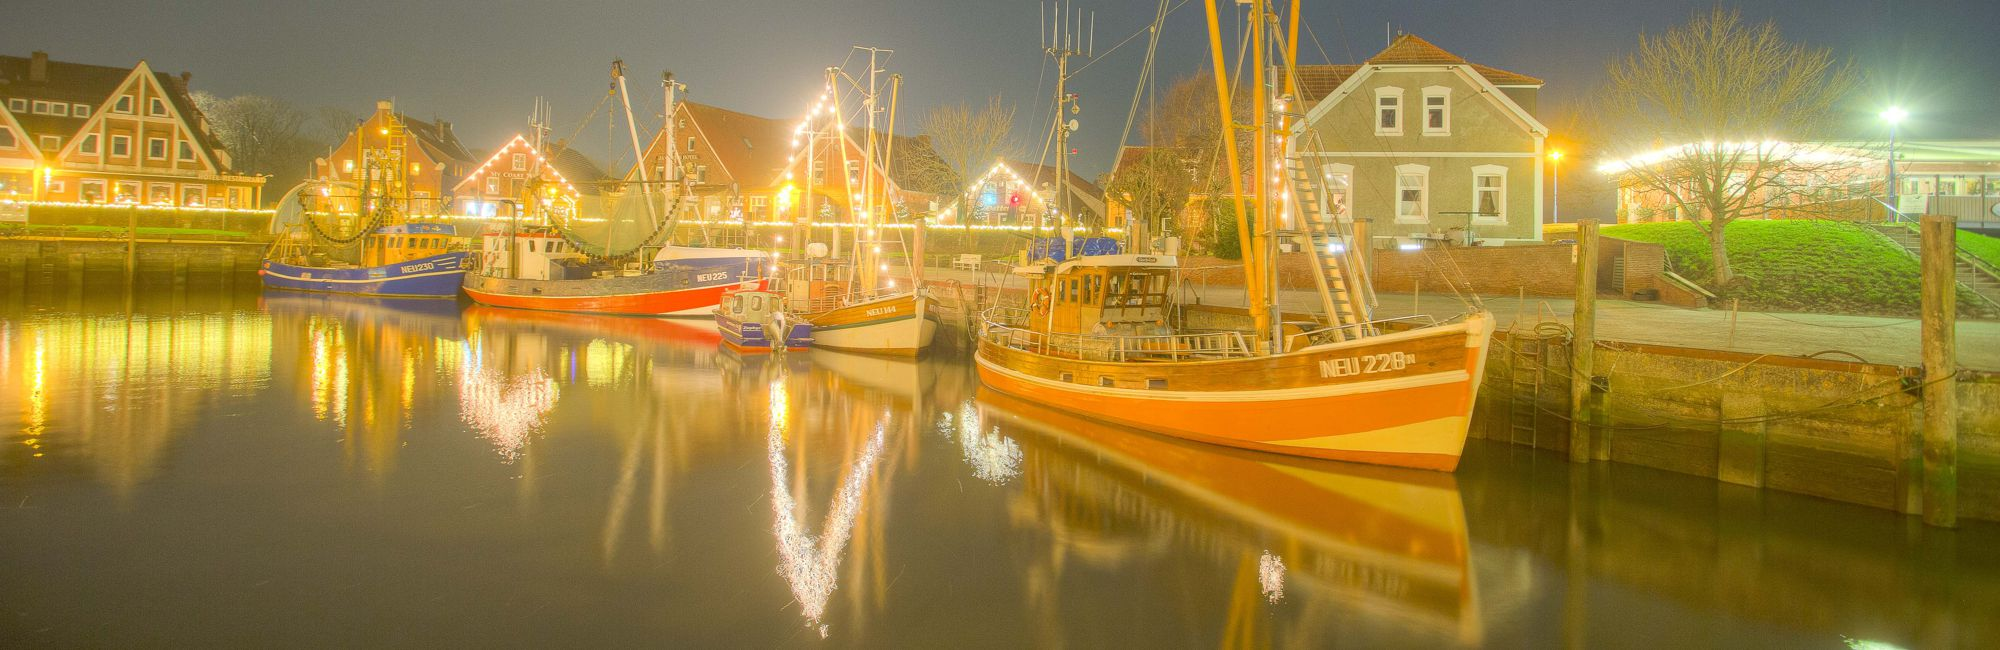 Silvester an der Nordsee feiern in Neuharlingersiel